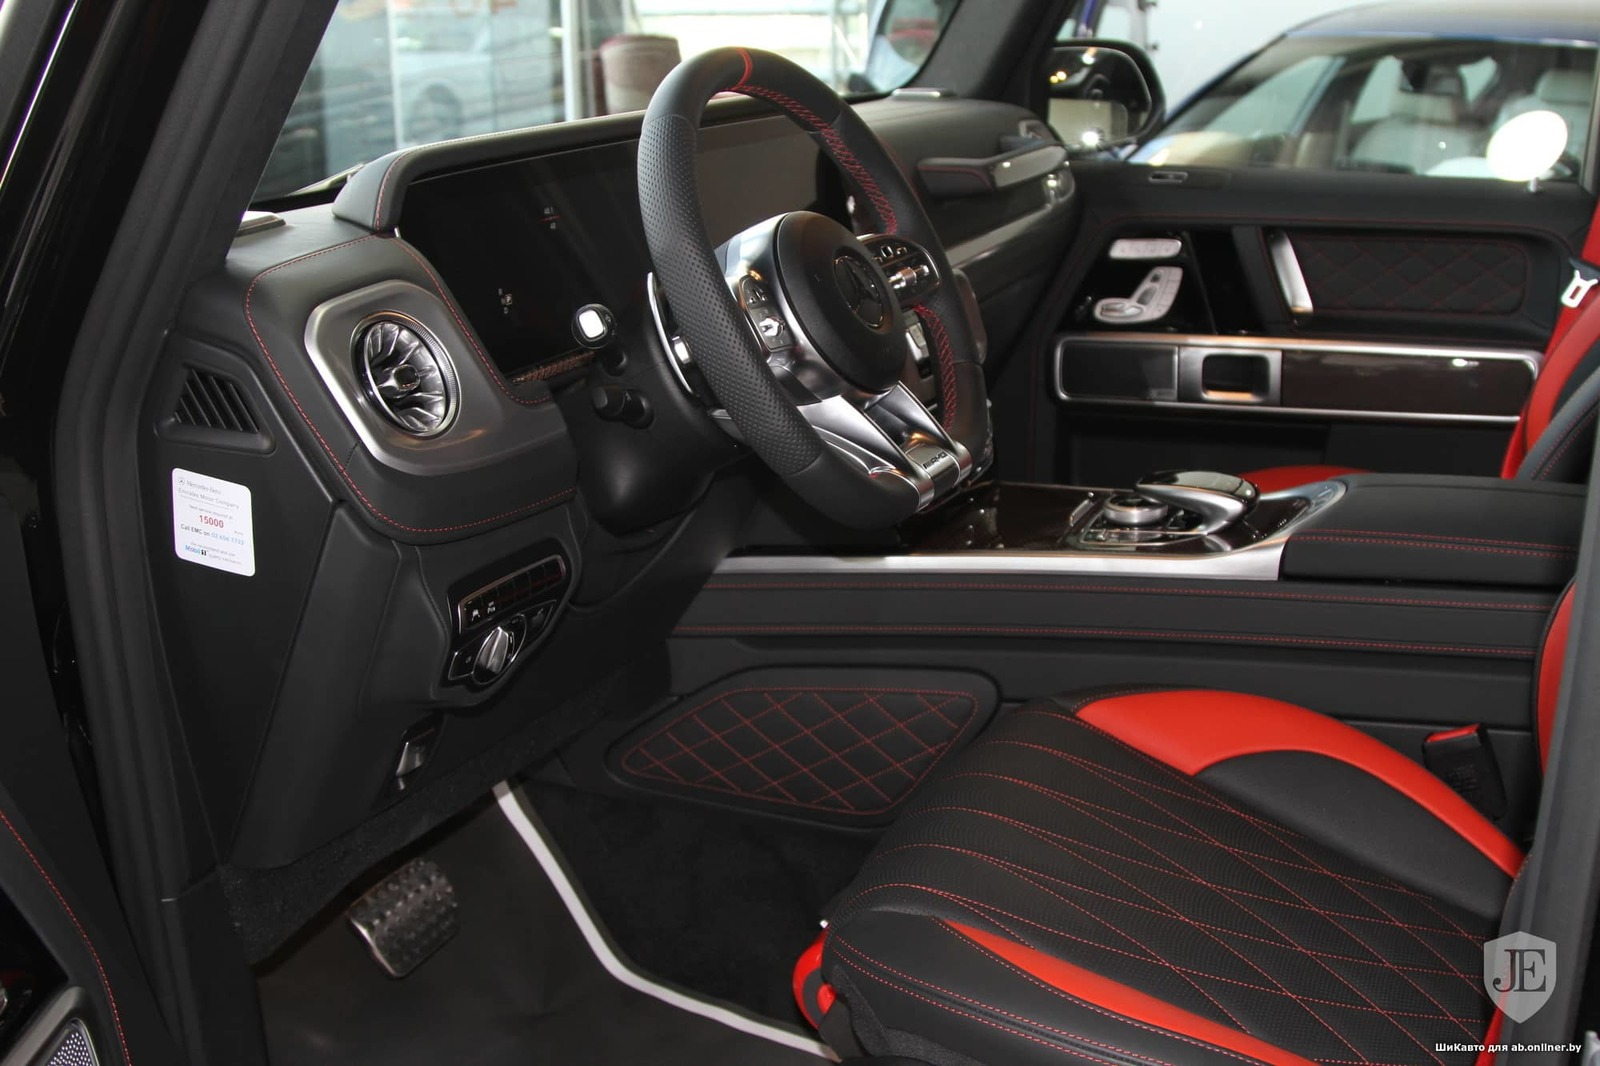 Mercedes-Benz G63 Edition 1 (09/19)